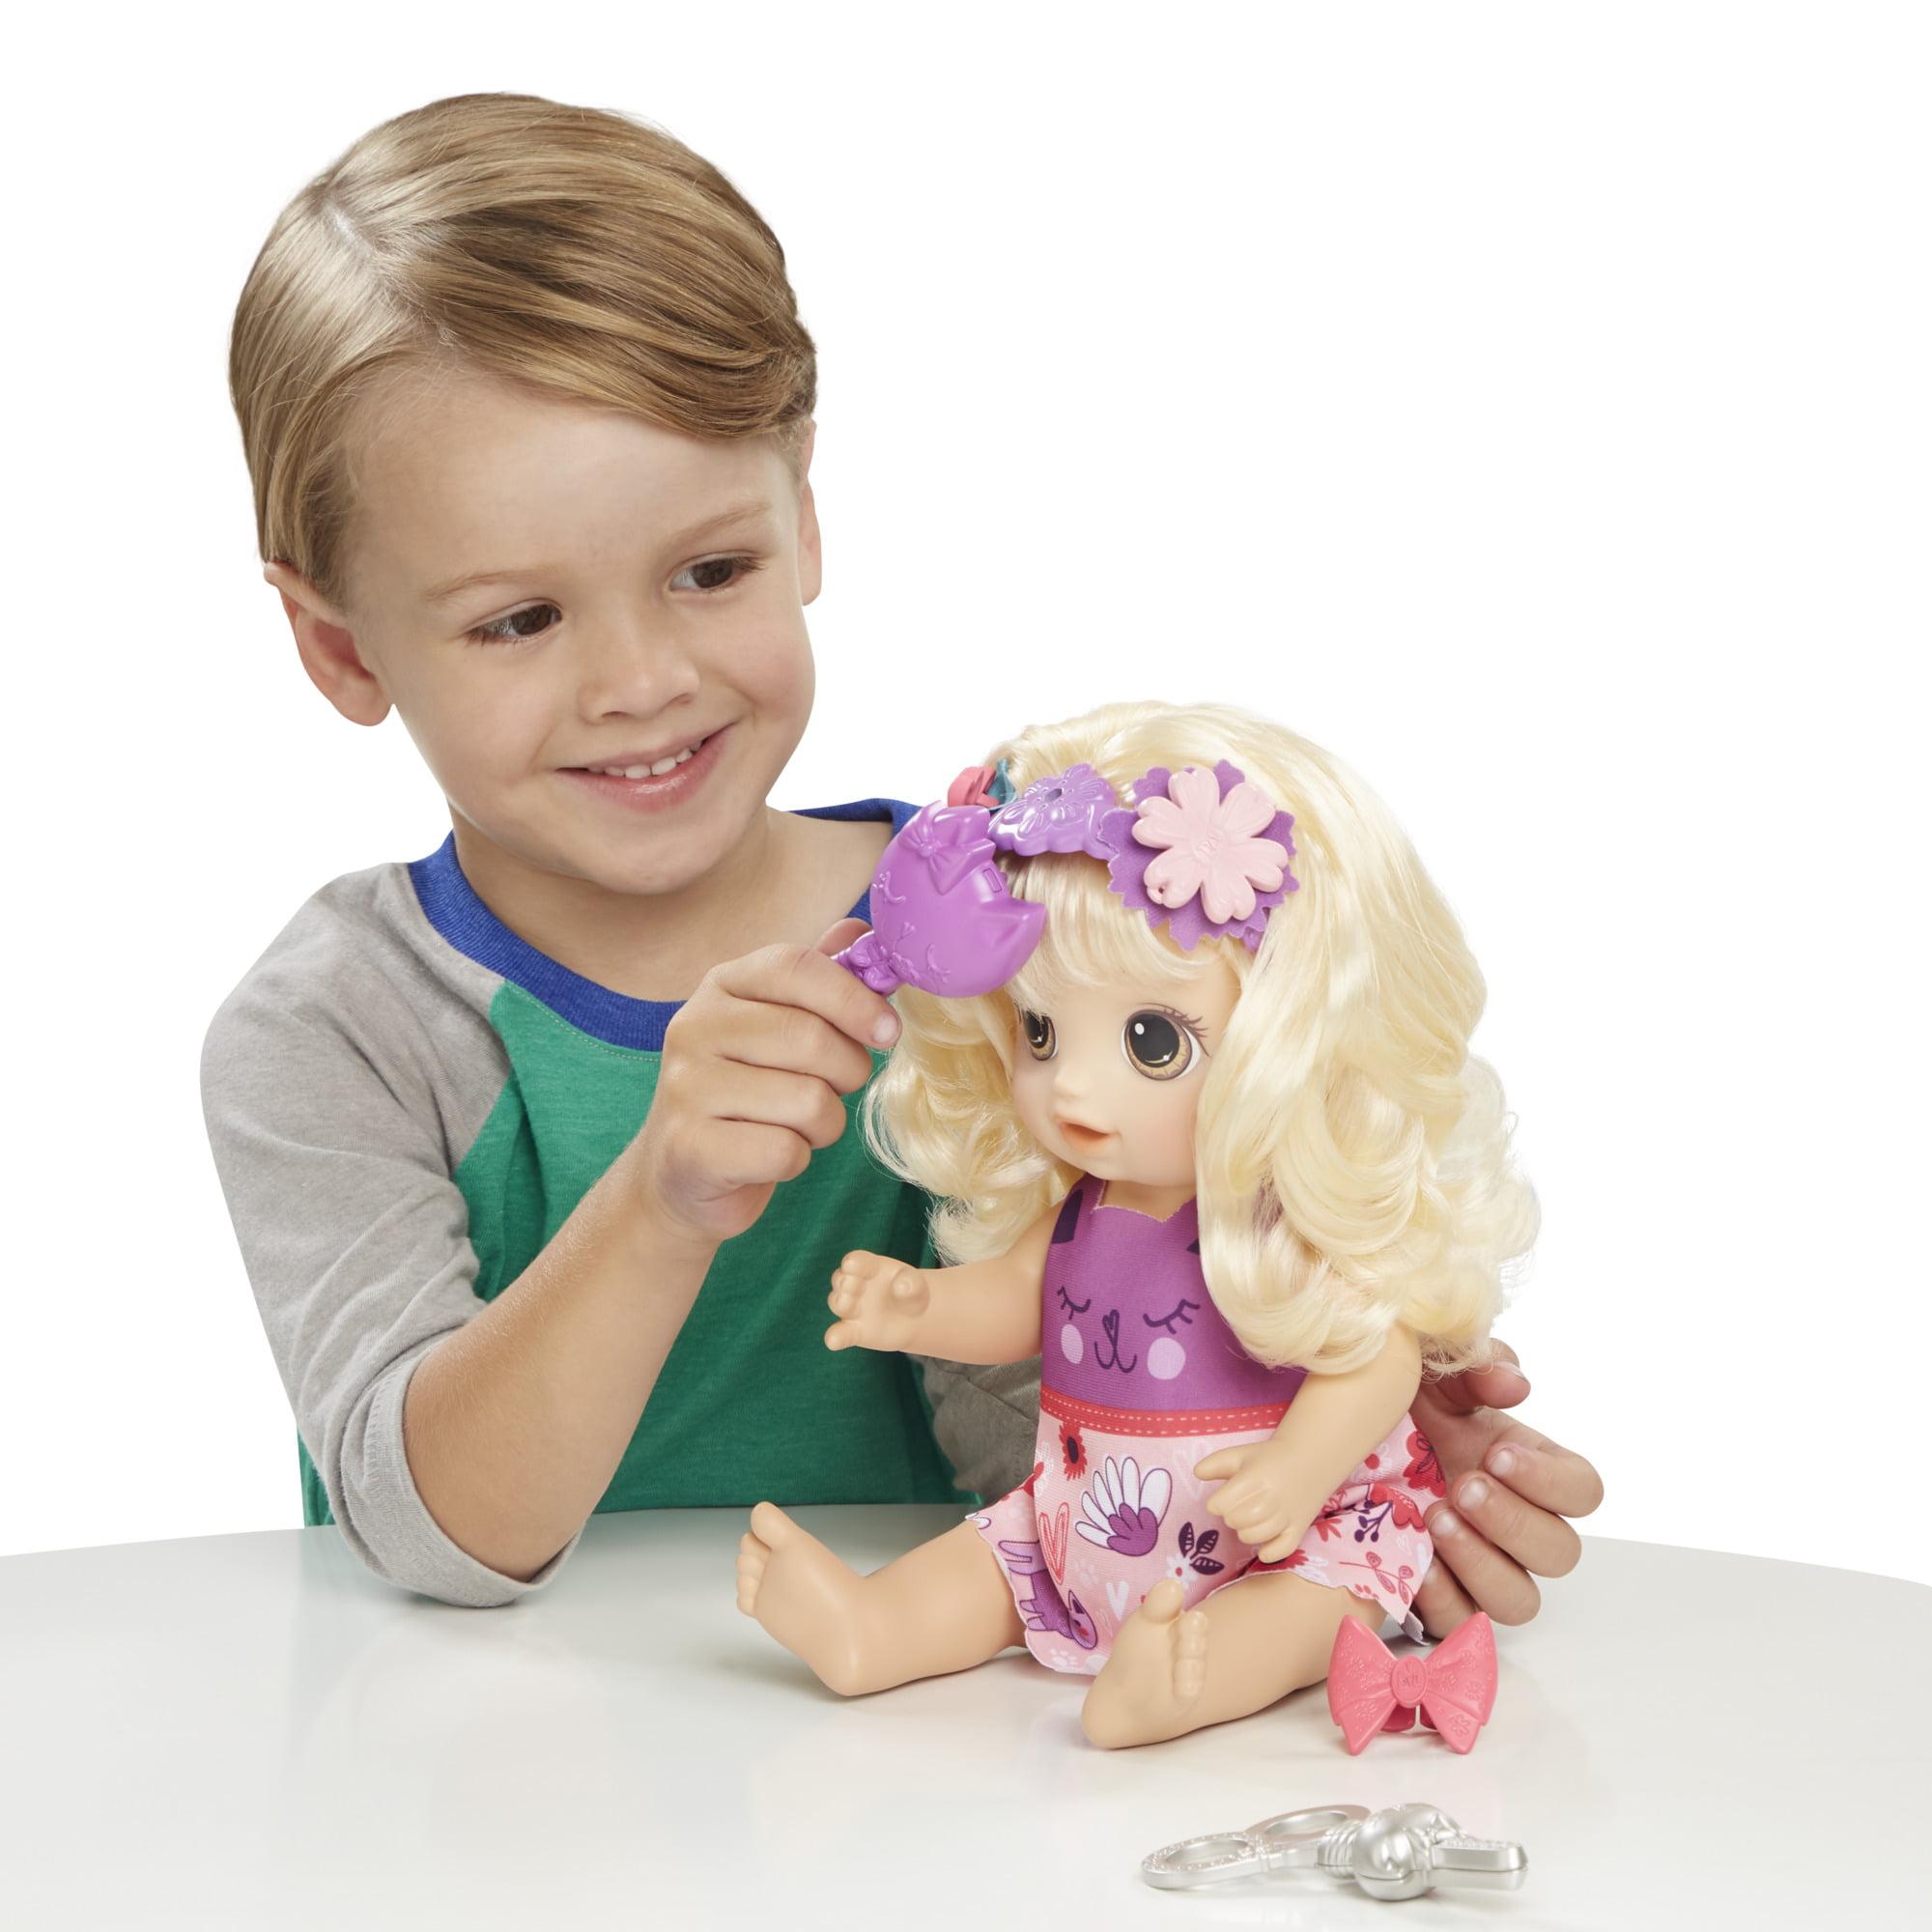 Baby Alive Snip N Style Baby Blonde Hair Talking Doll With Bangs That Grow Walmart Com Walmart Com